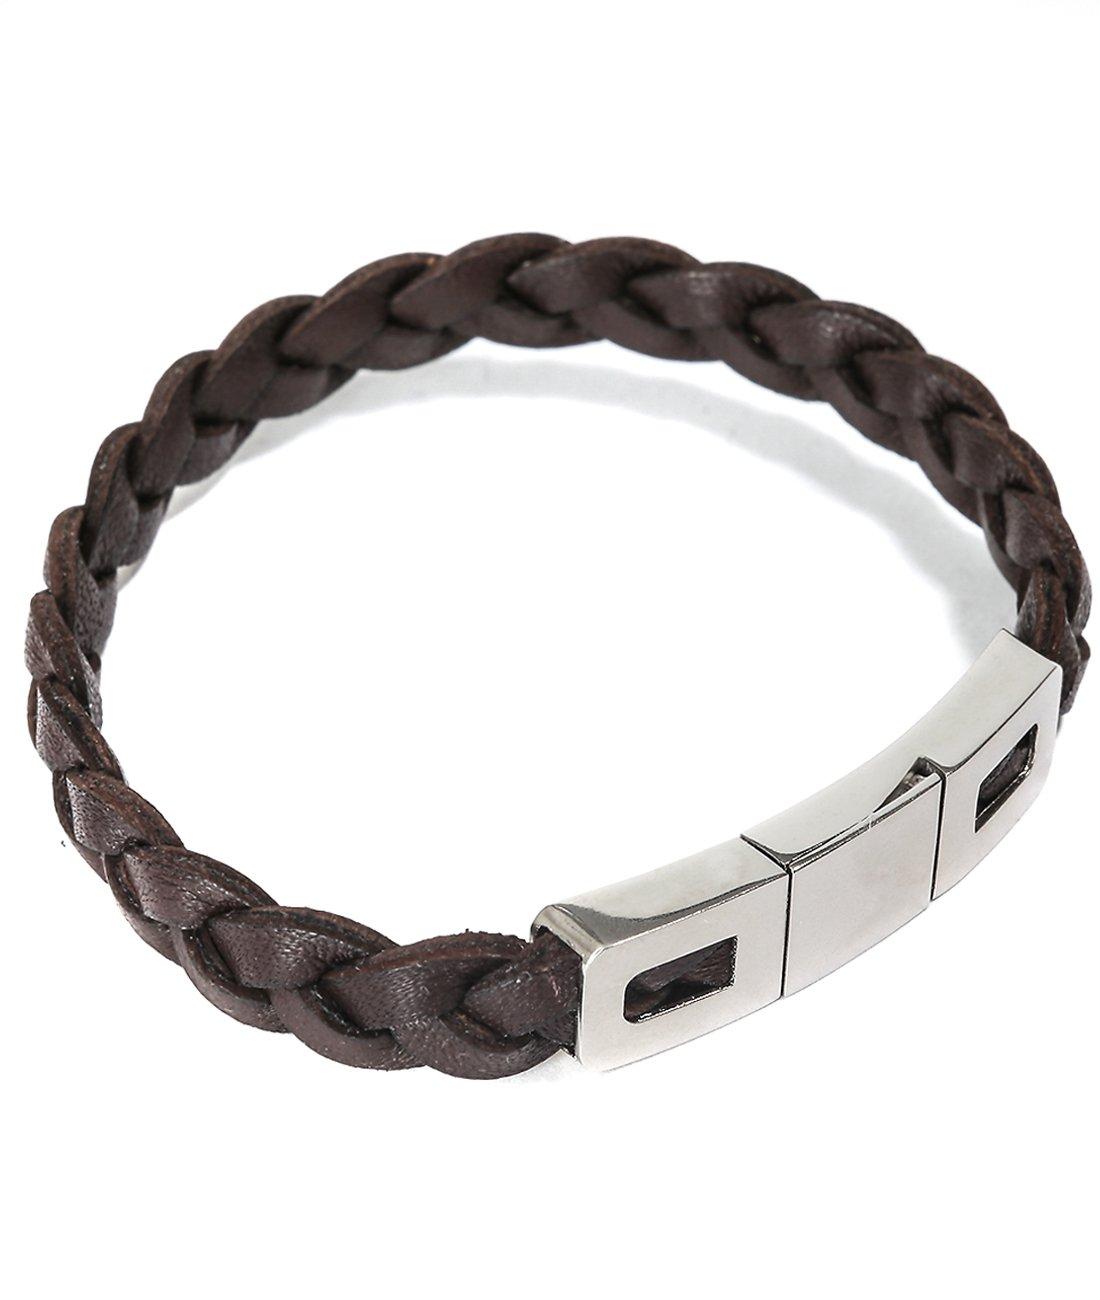 Mon Art Women's Braided Bracelet with Metal Clip Closure XS Dark Brown